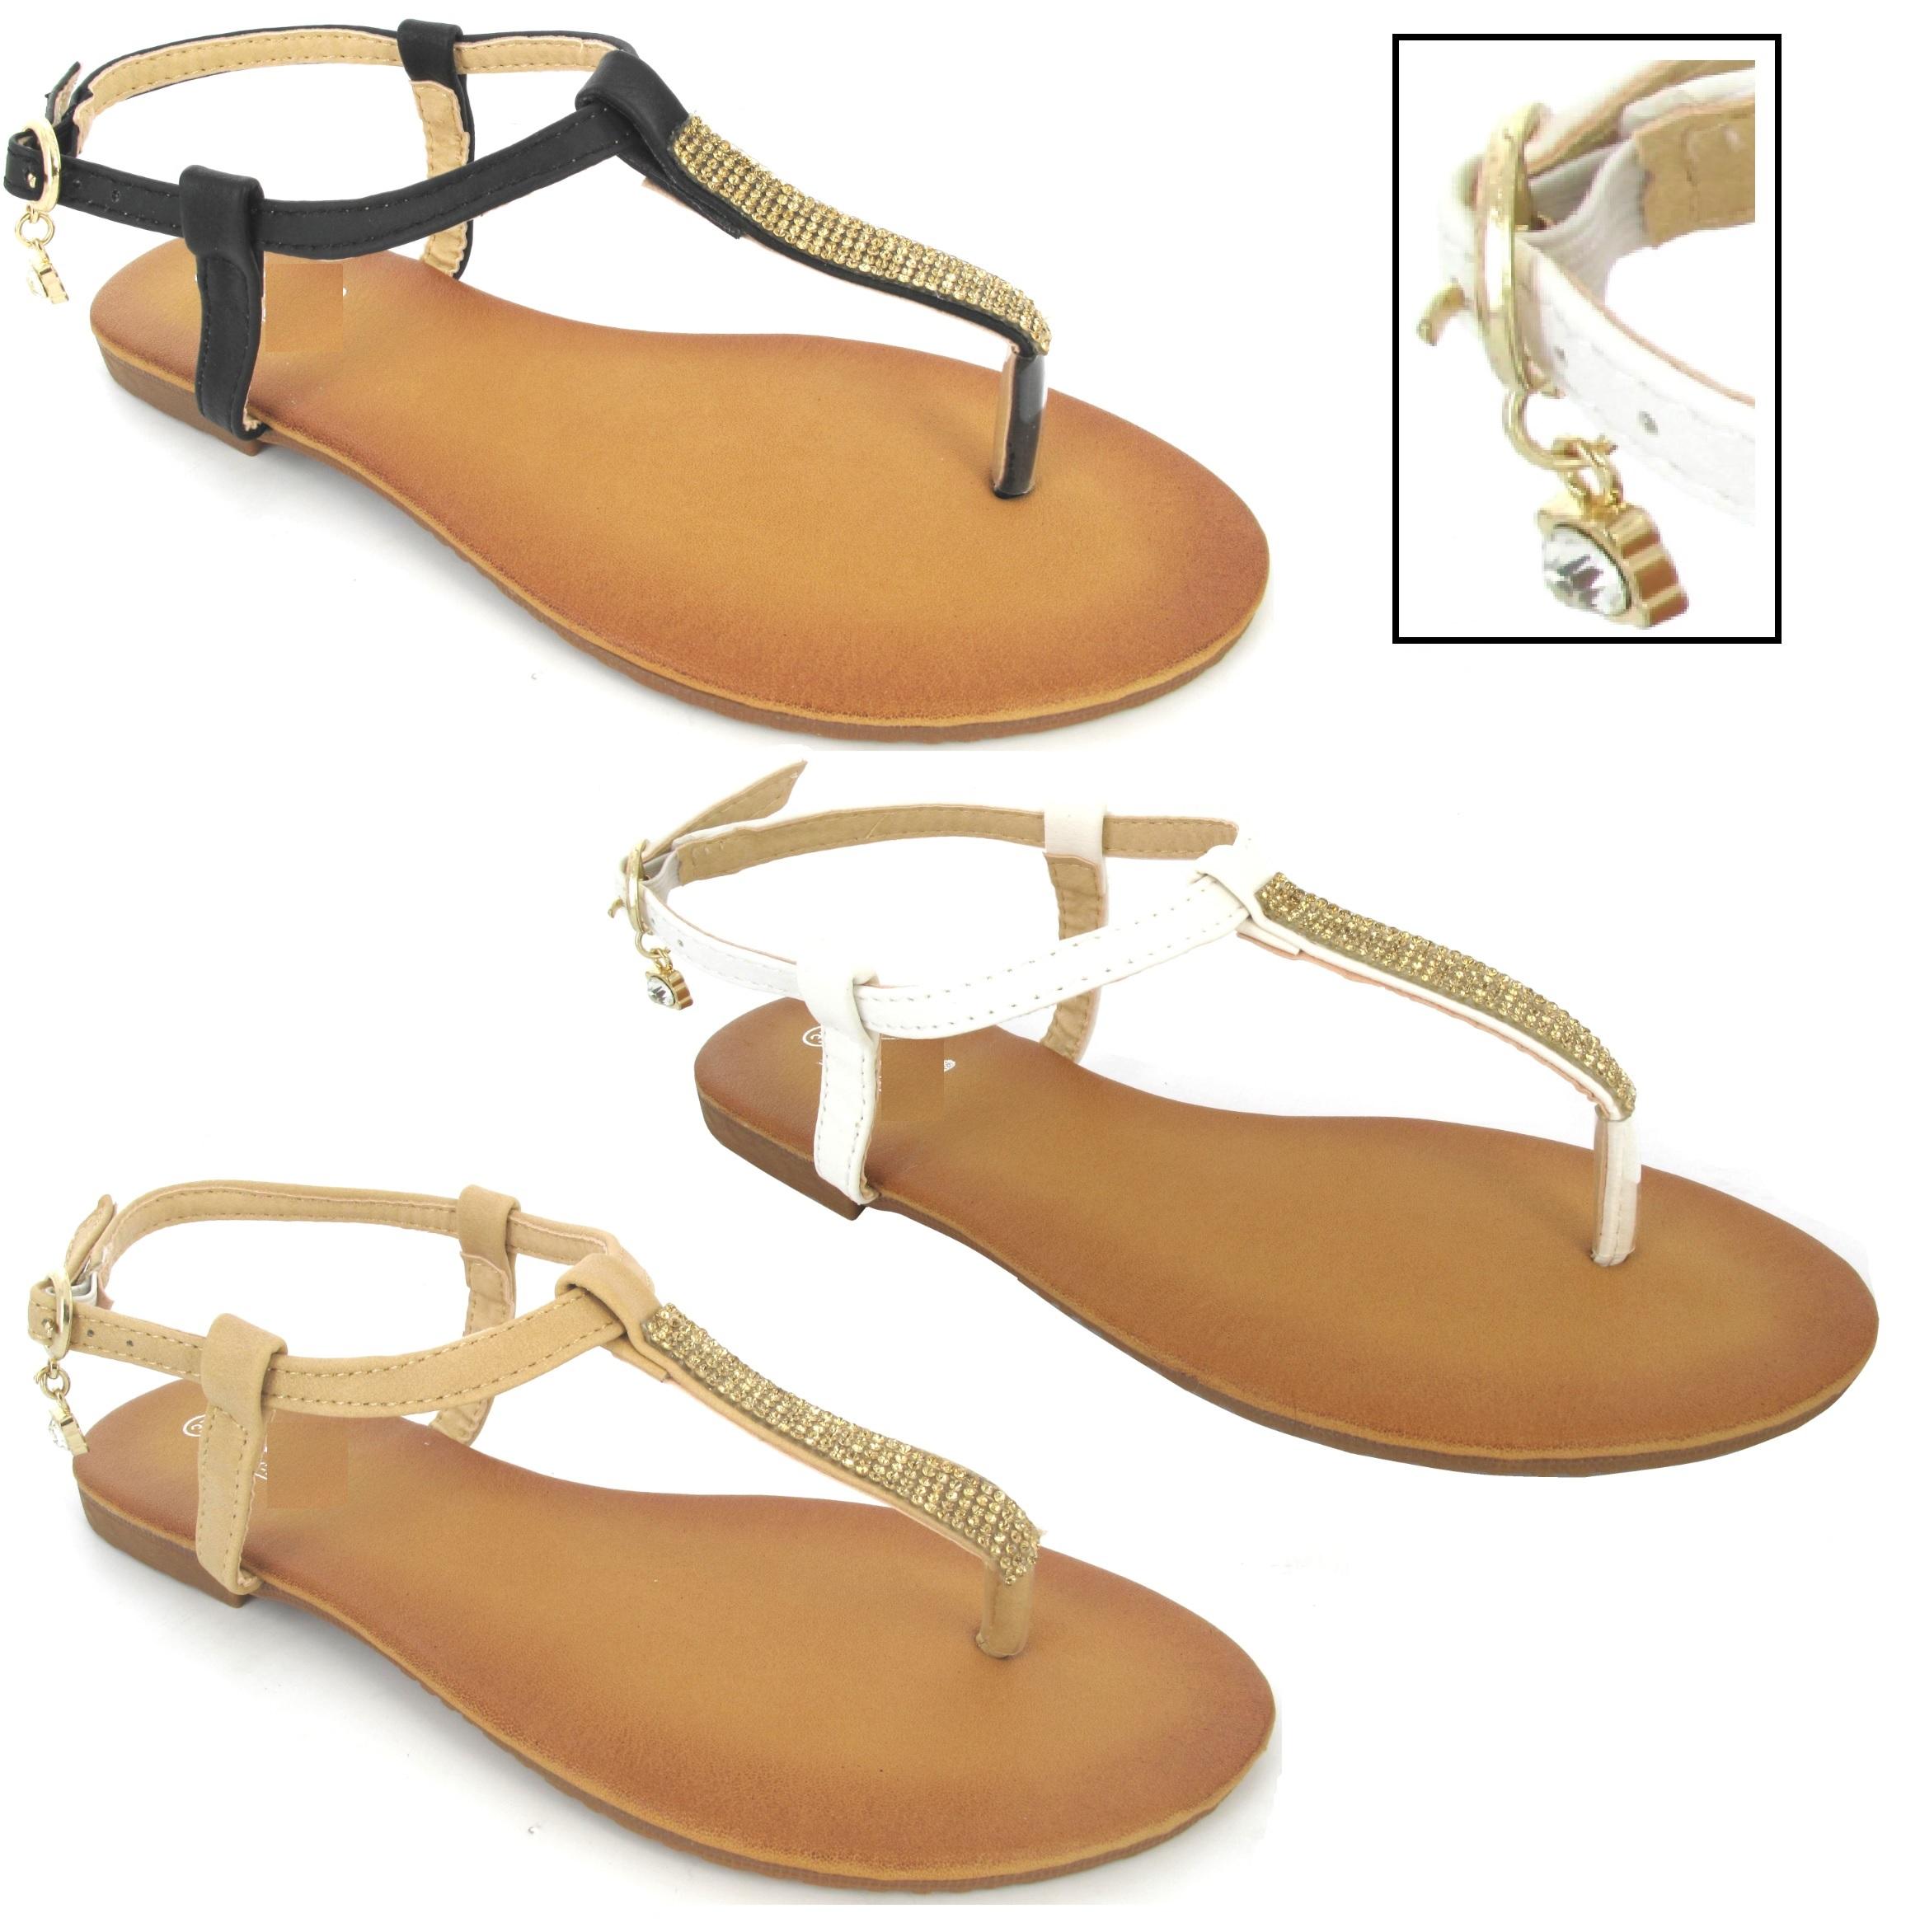 flip flops damen flach diamanten zehentrenner sommer sandalen ebay. Black Bedroom Furniture Sets. Home Design Ideas